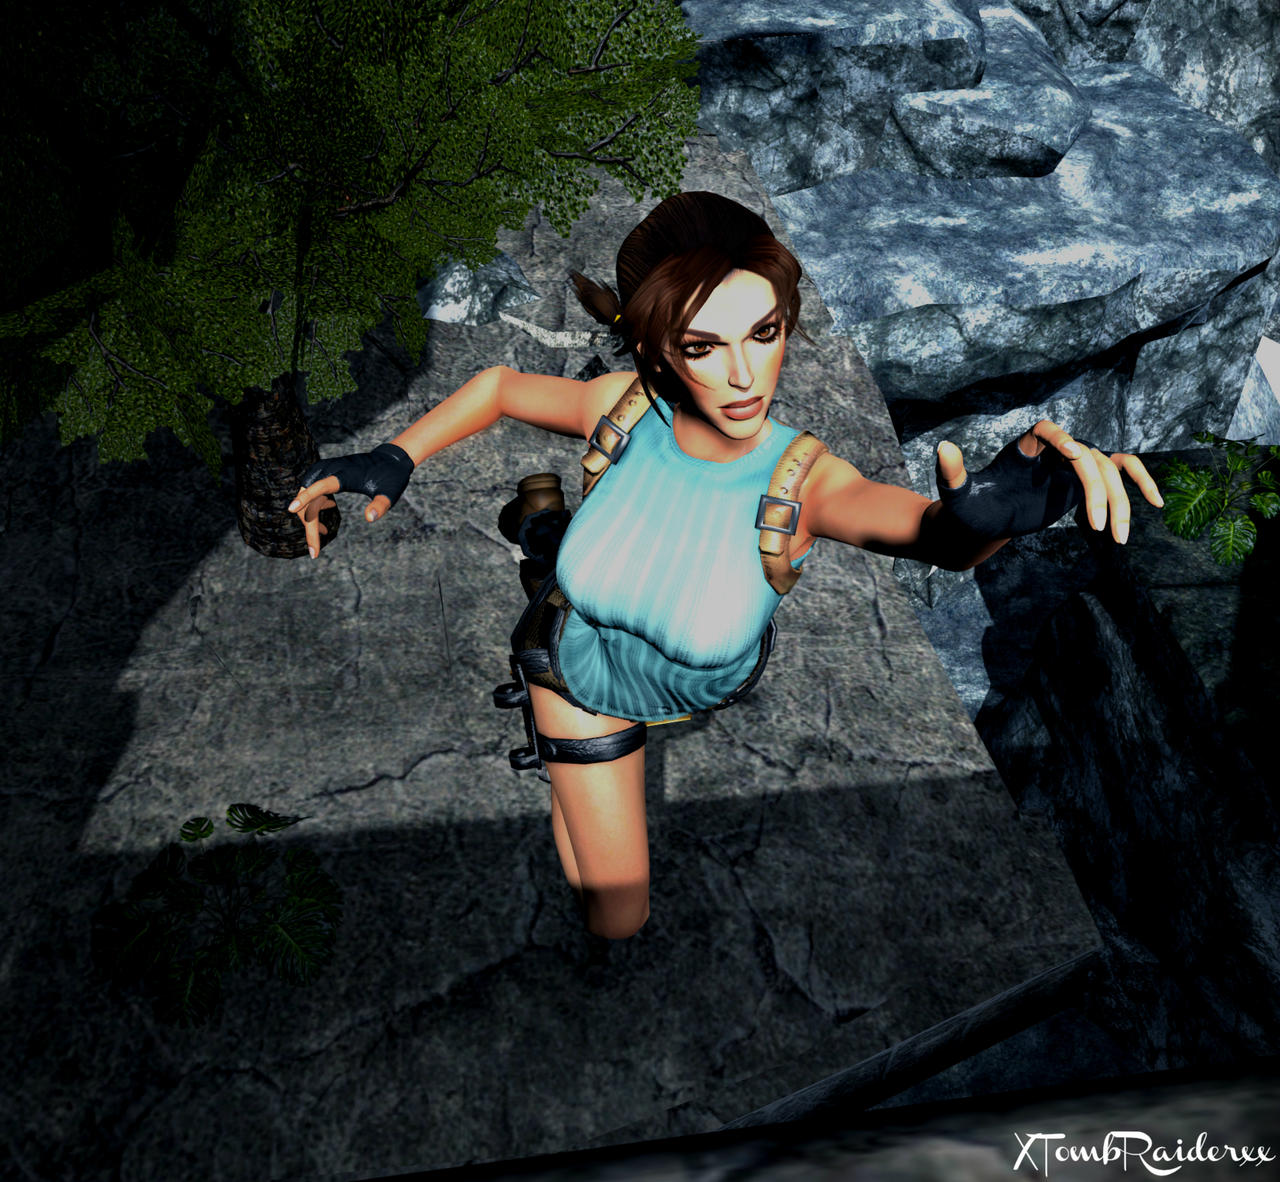 Lara Portrait 53 by XTombRaiderxx